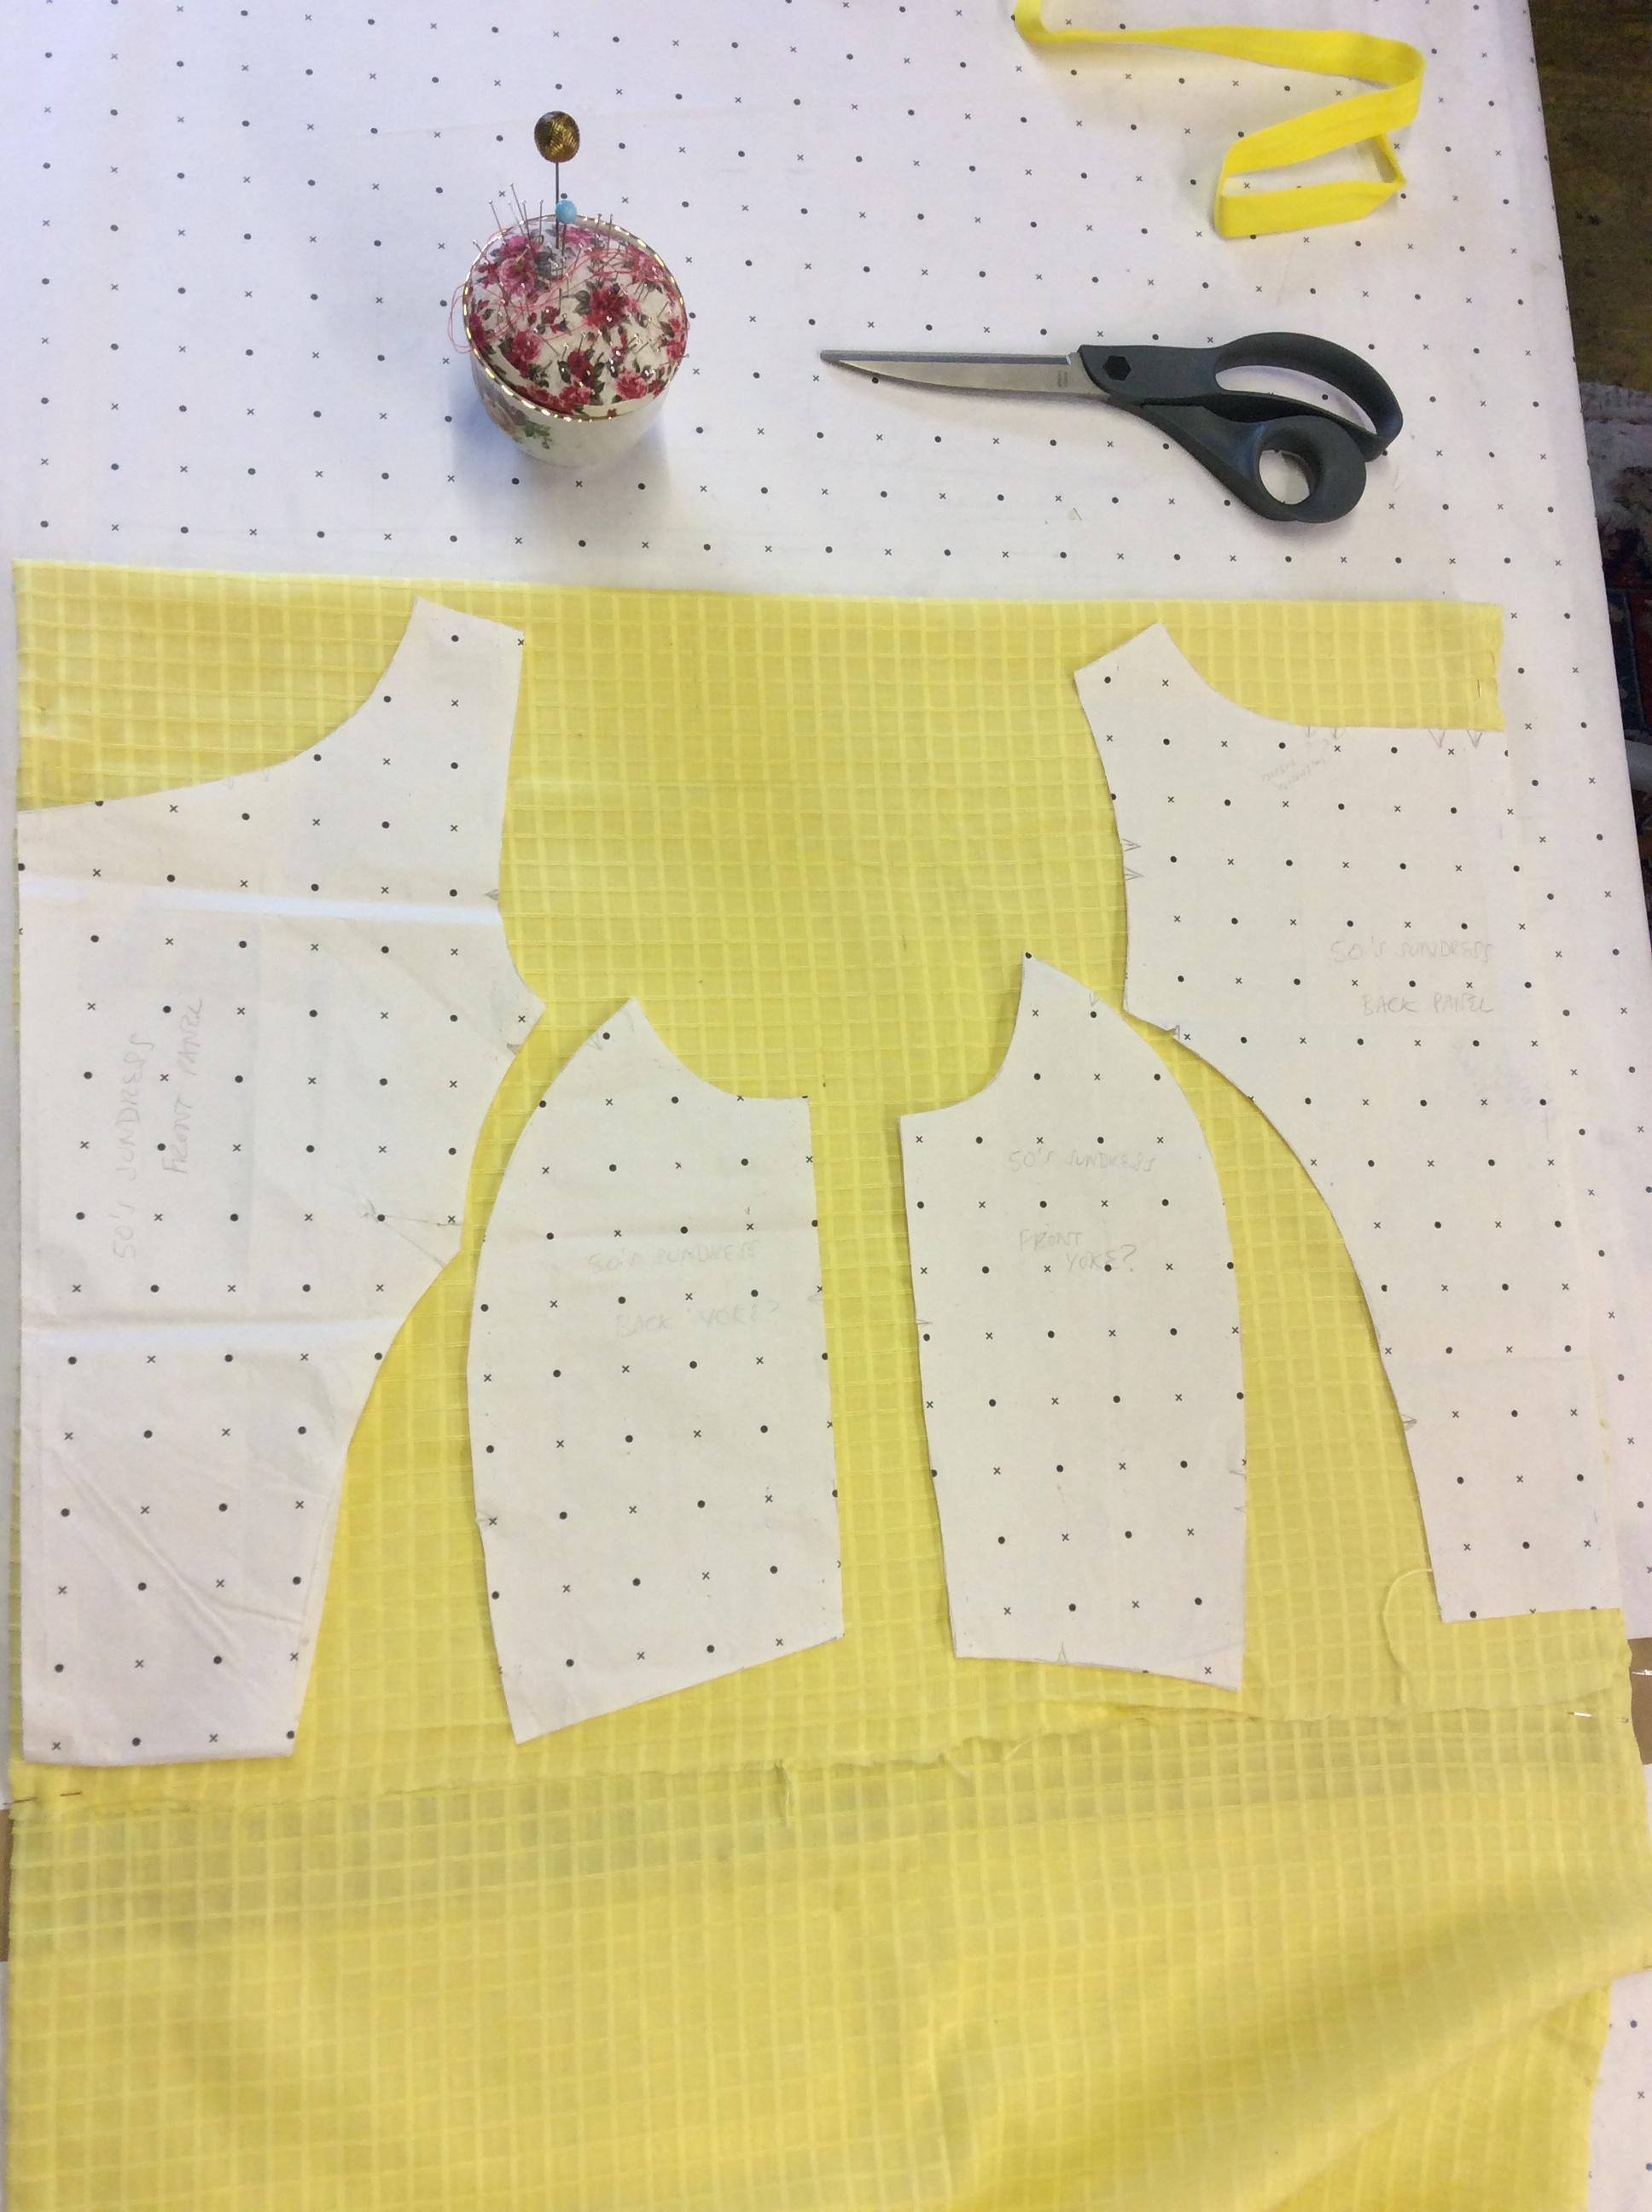 Yellow Cotton Dress at the Studio